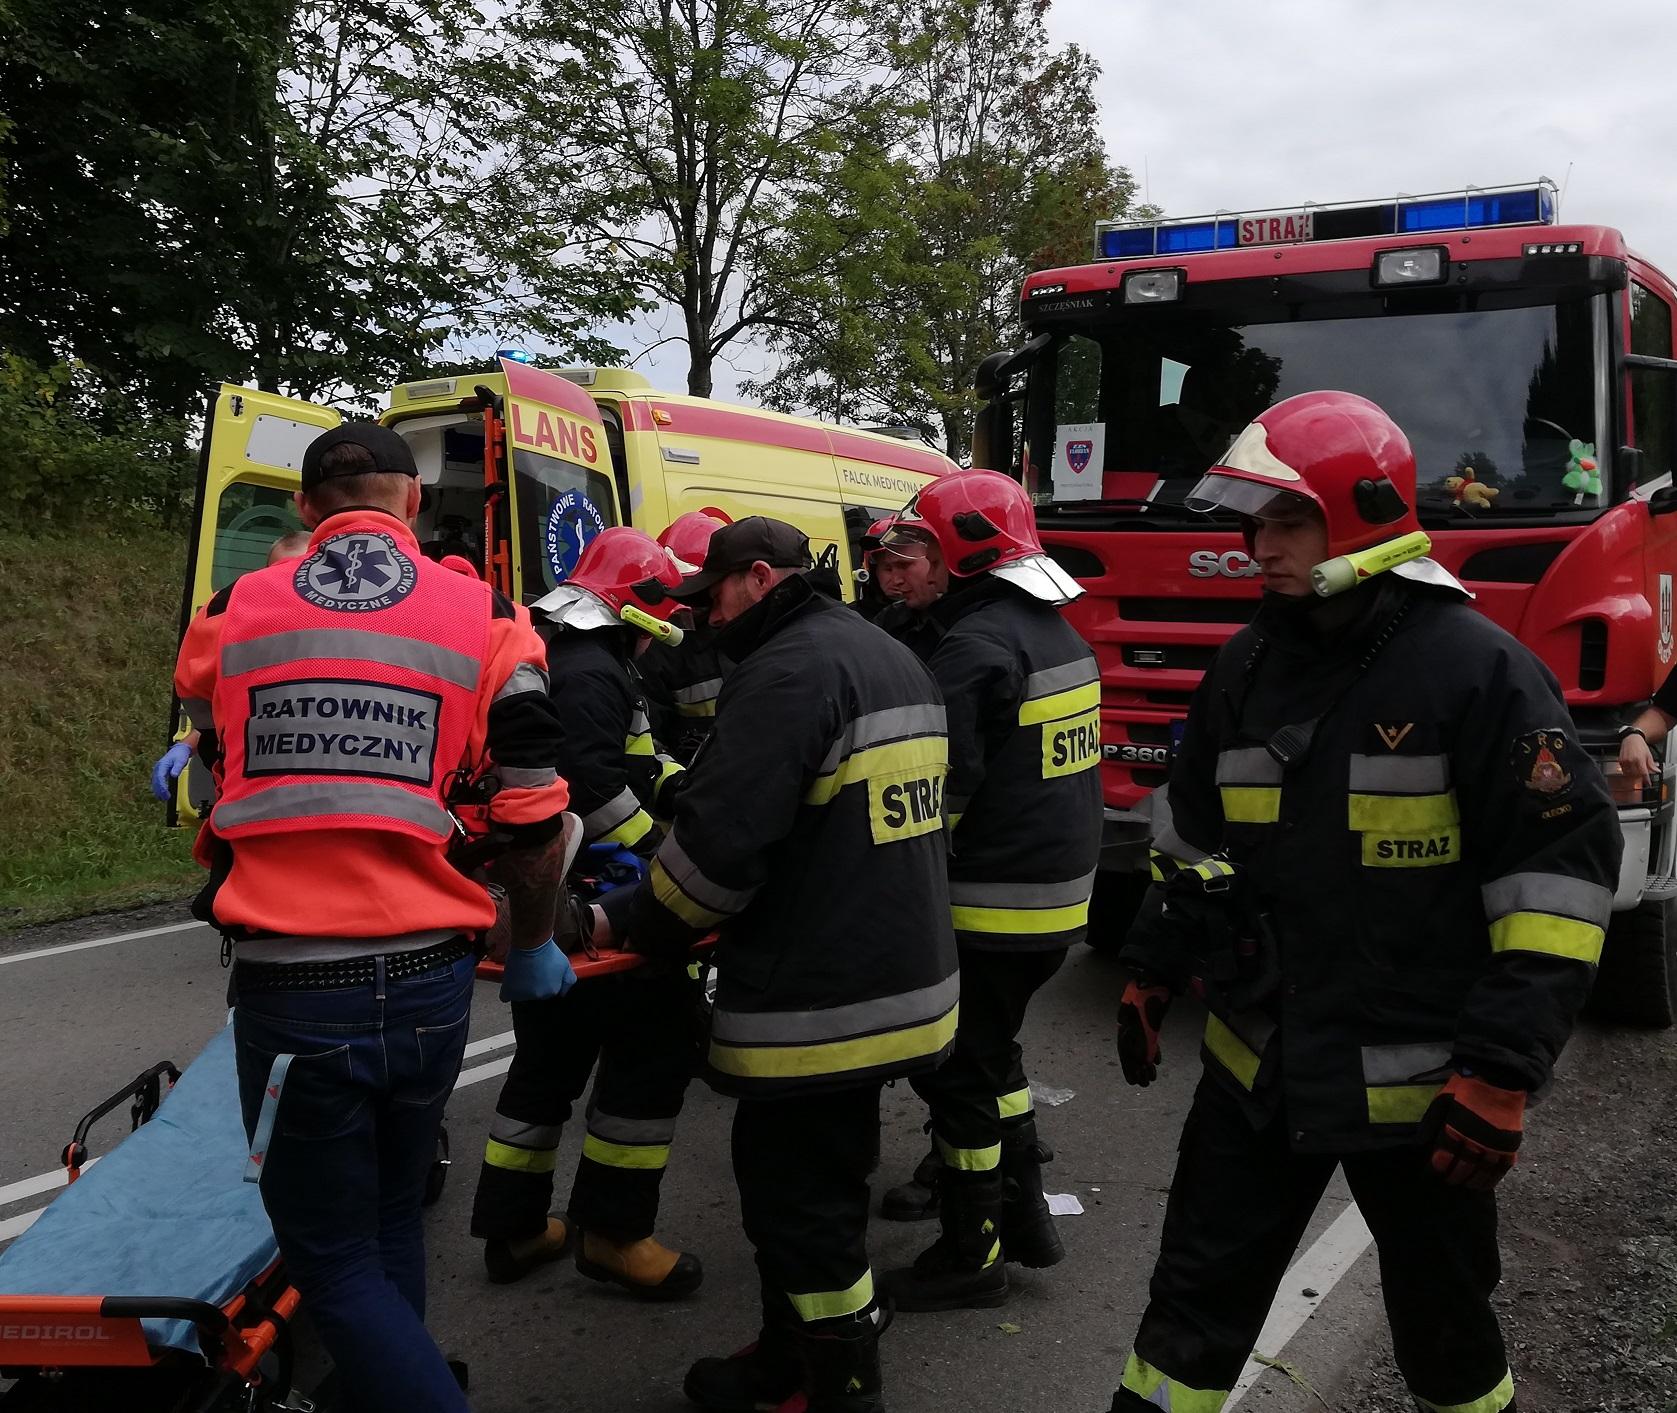 http://m.wm.pl/2018/09/orig/0000063984-wypadek-przytuly-14-09-18a-494107.jpg